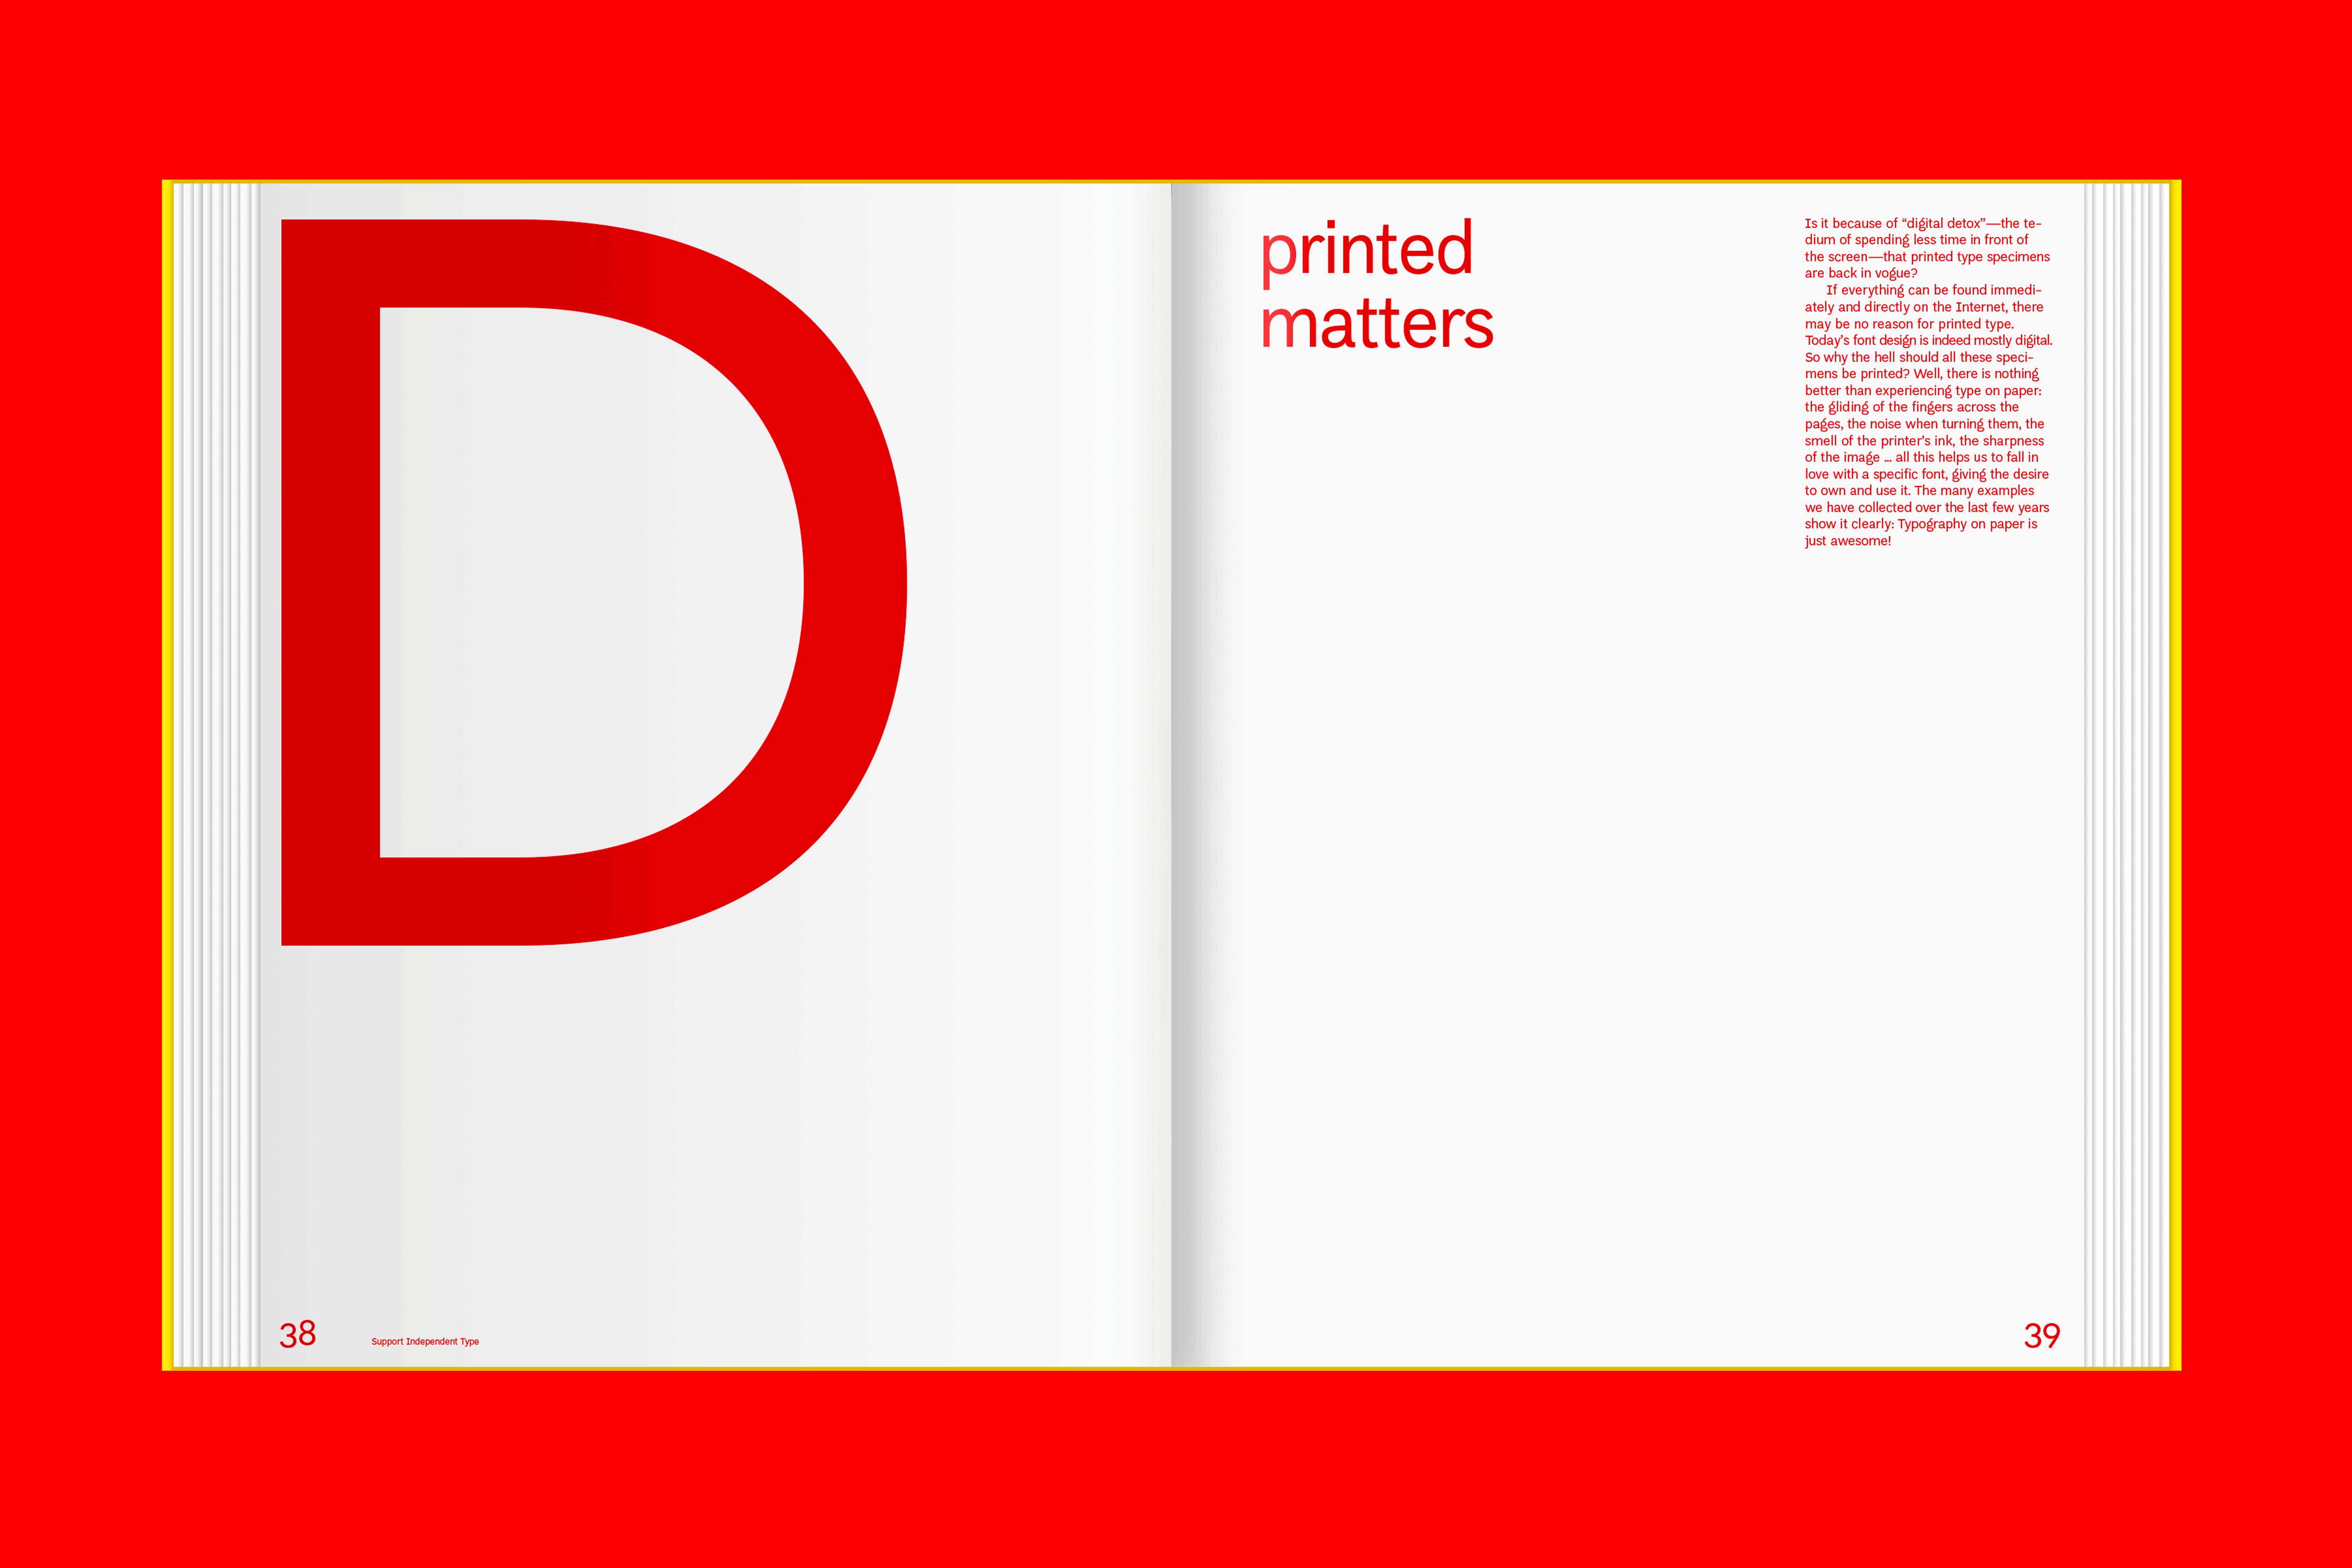 Slanted-Publiaktionen-Slanted-Publishers-Support-Independent-Type_10